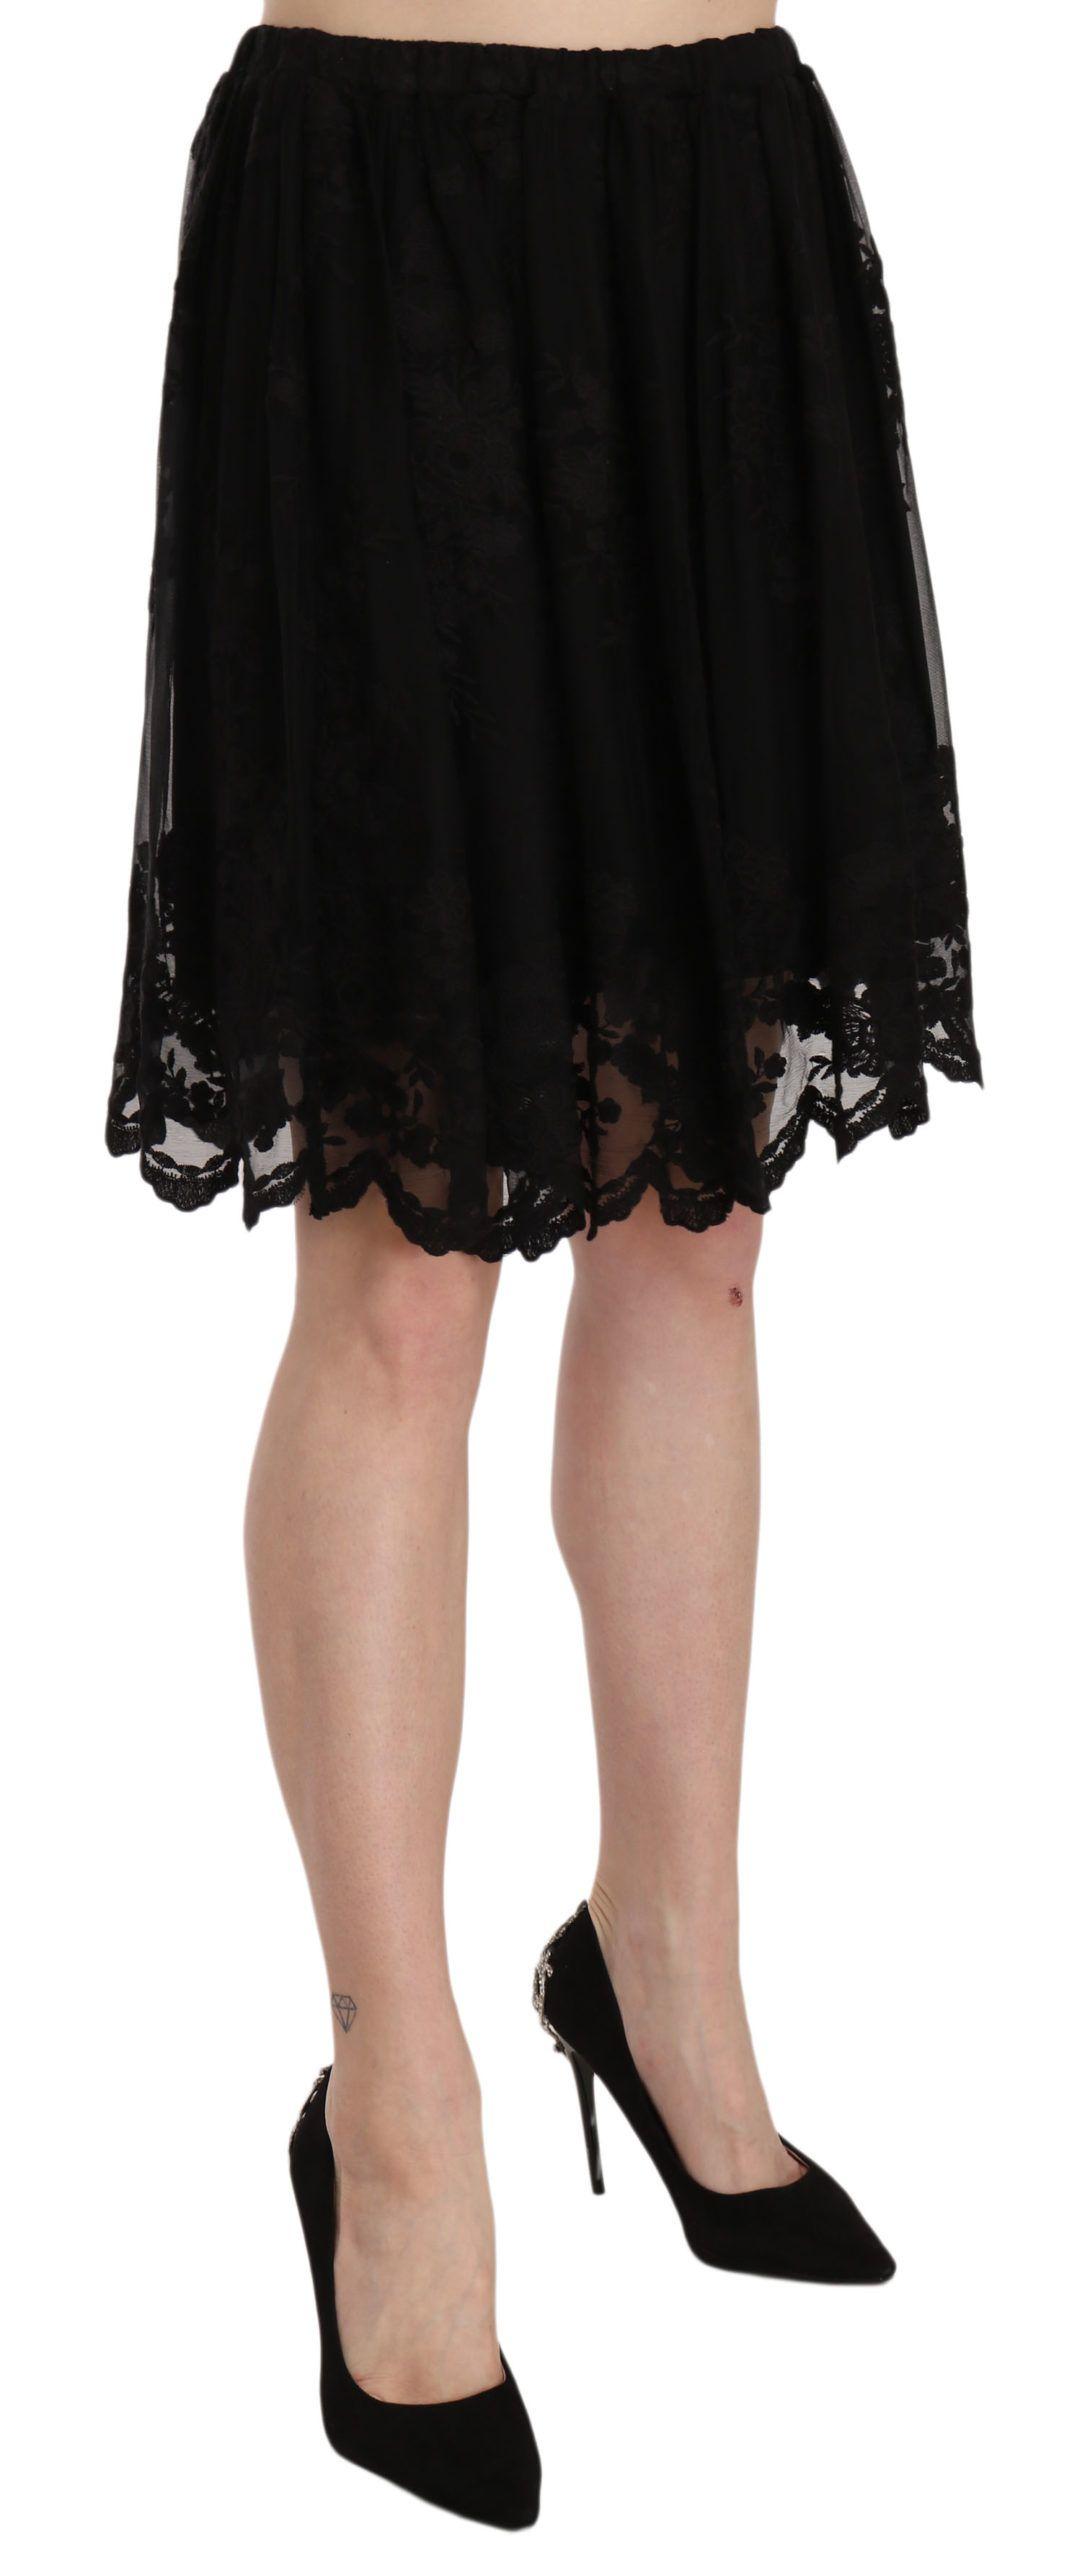 Twinset Black Cotton A-Line Pleated Mini Skirt